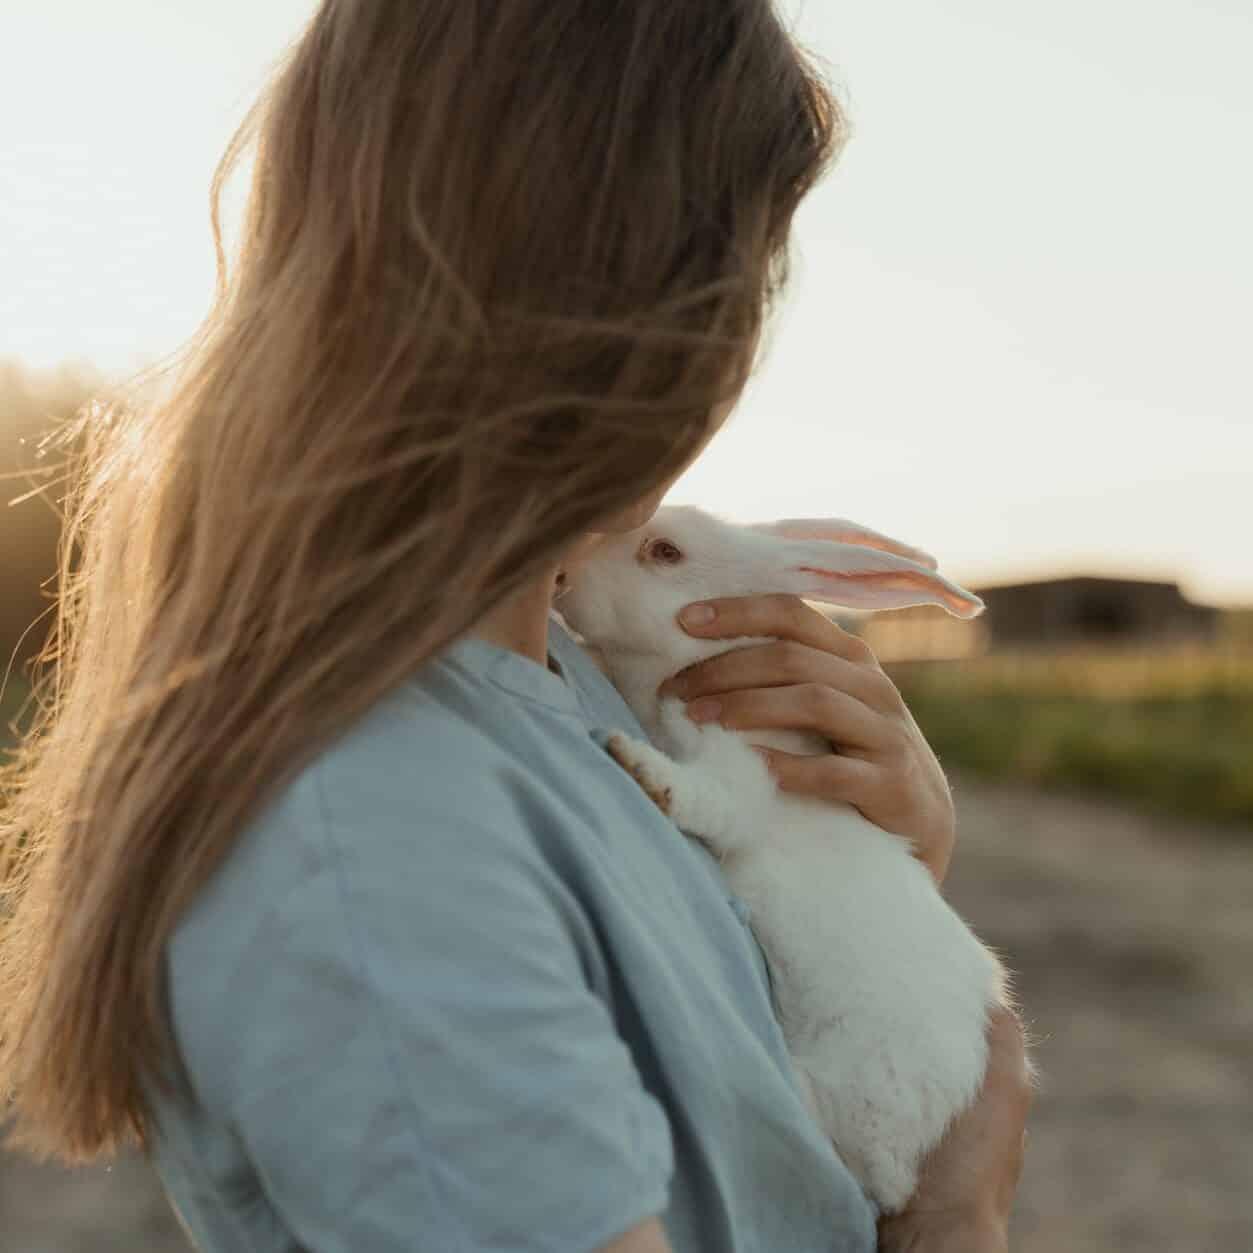 woman in blue long sleeve shirt holding white rabbit plush toy